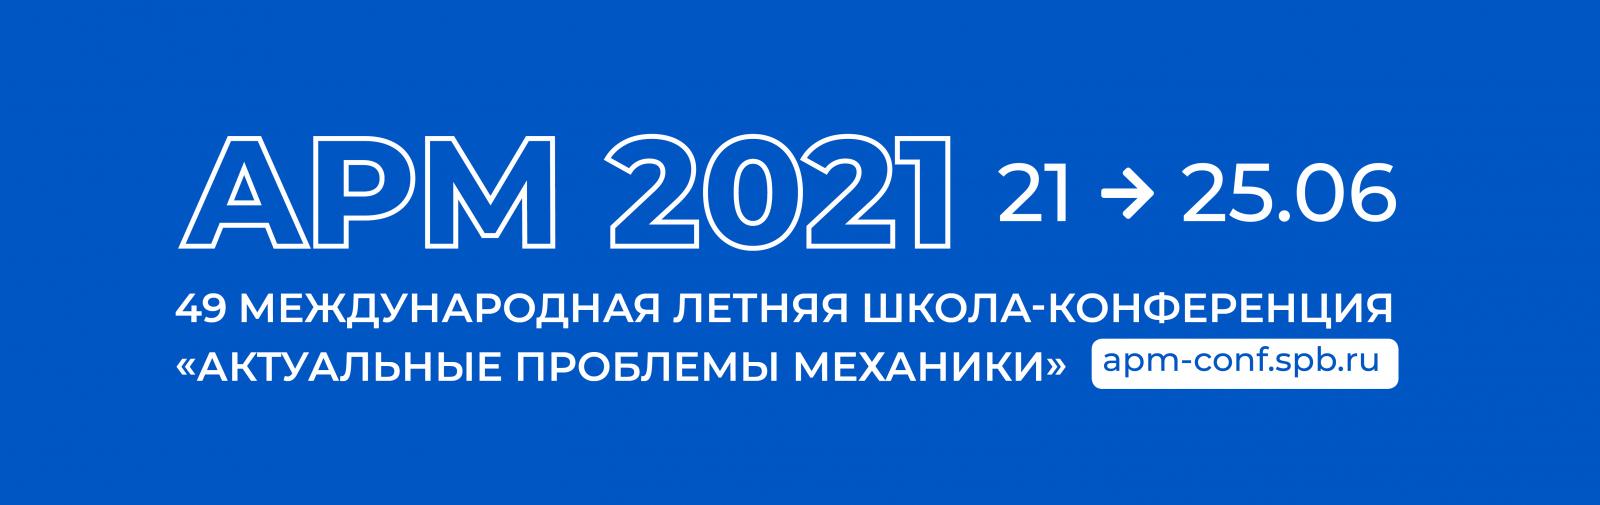 APM 2021